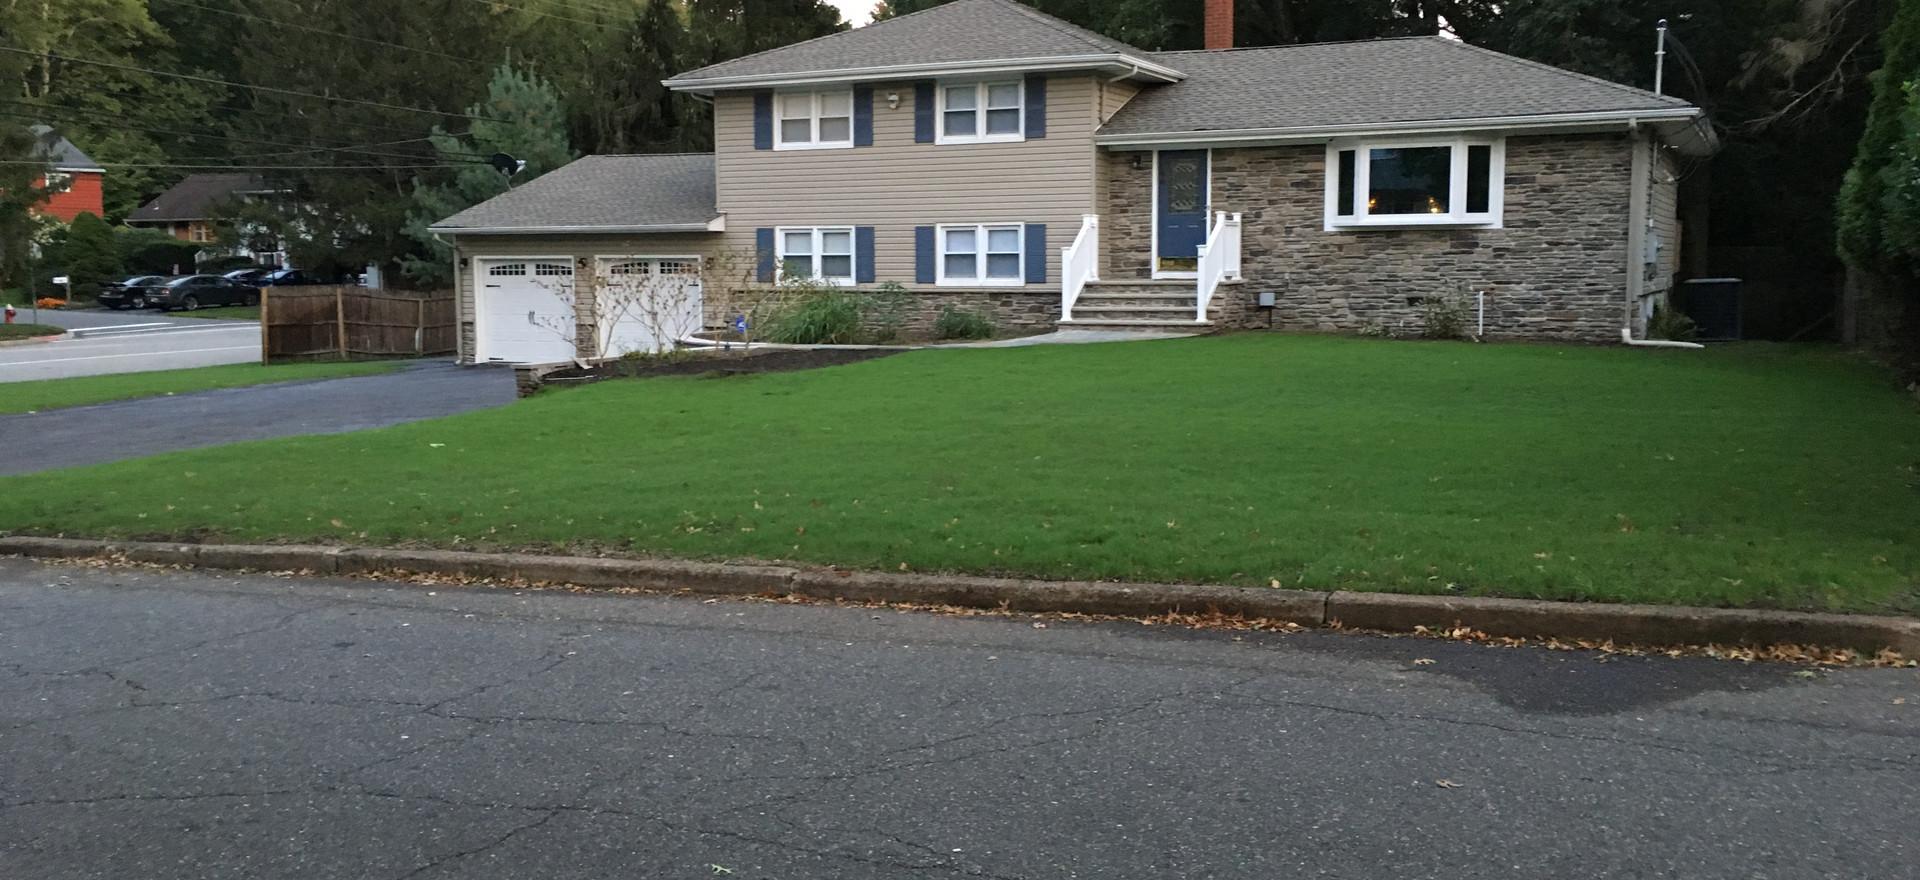 Grass 9 days after planting